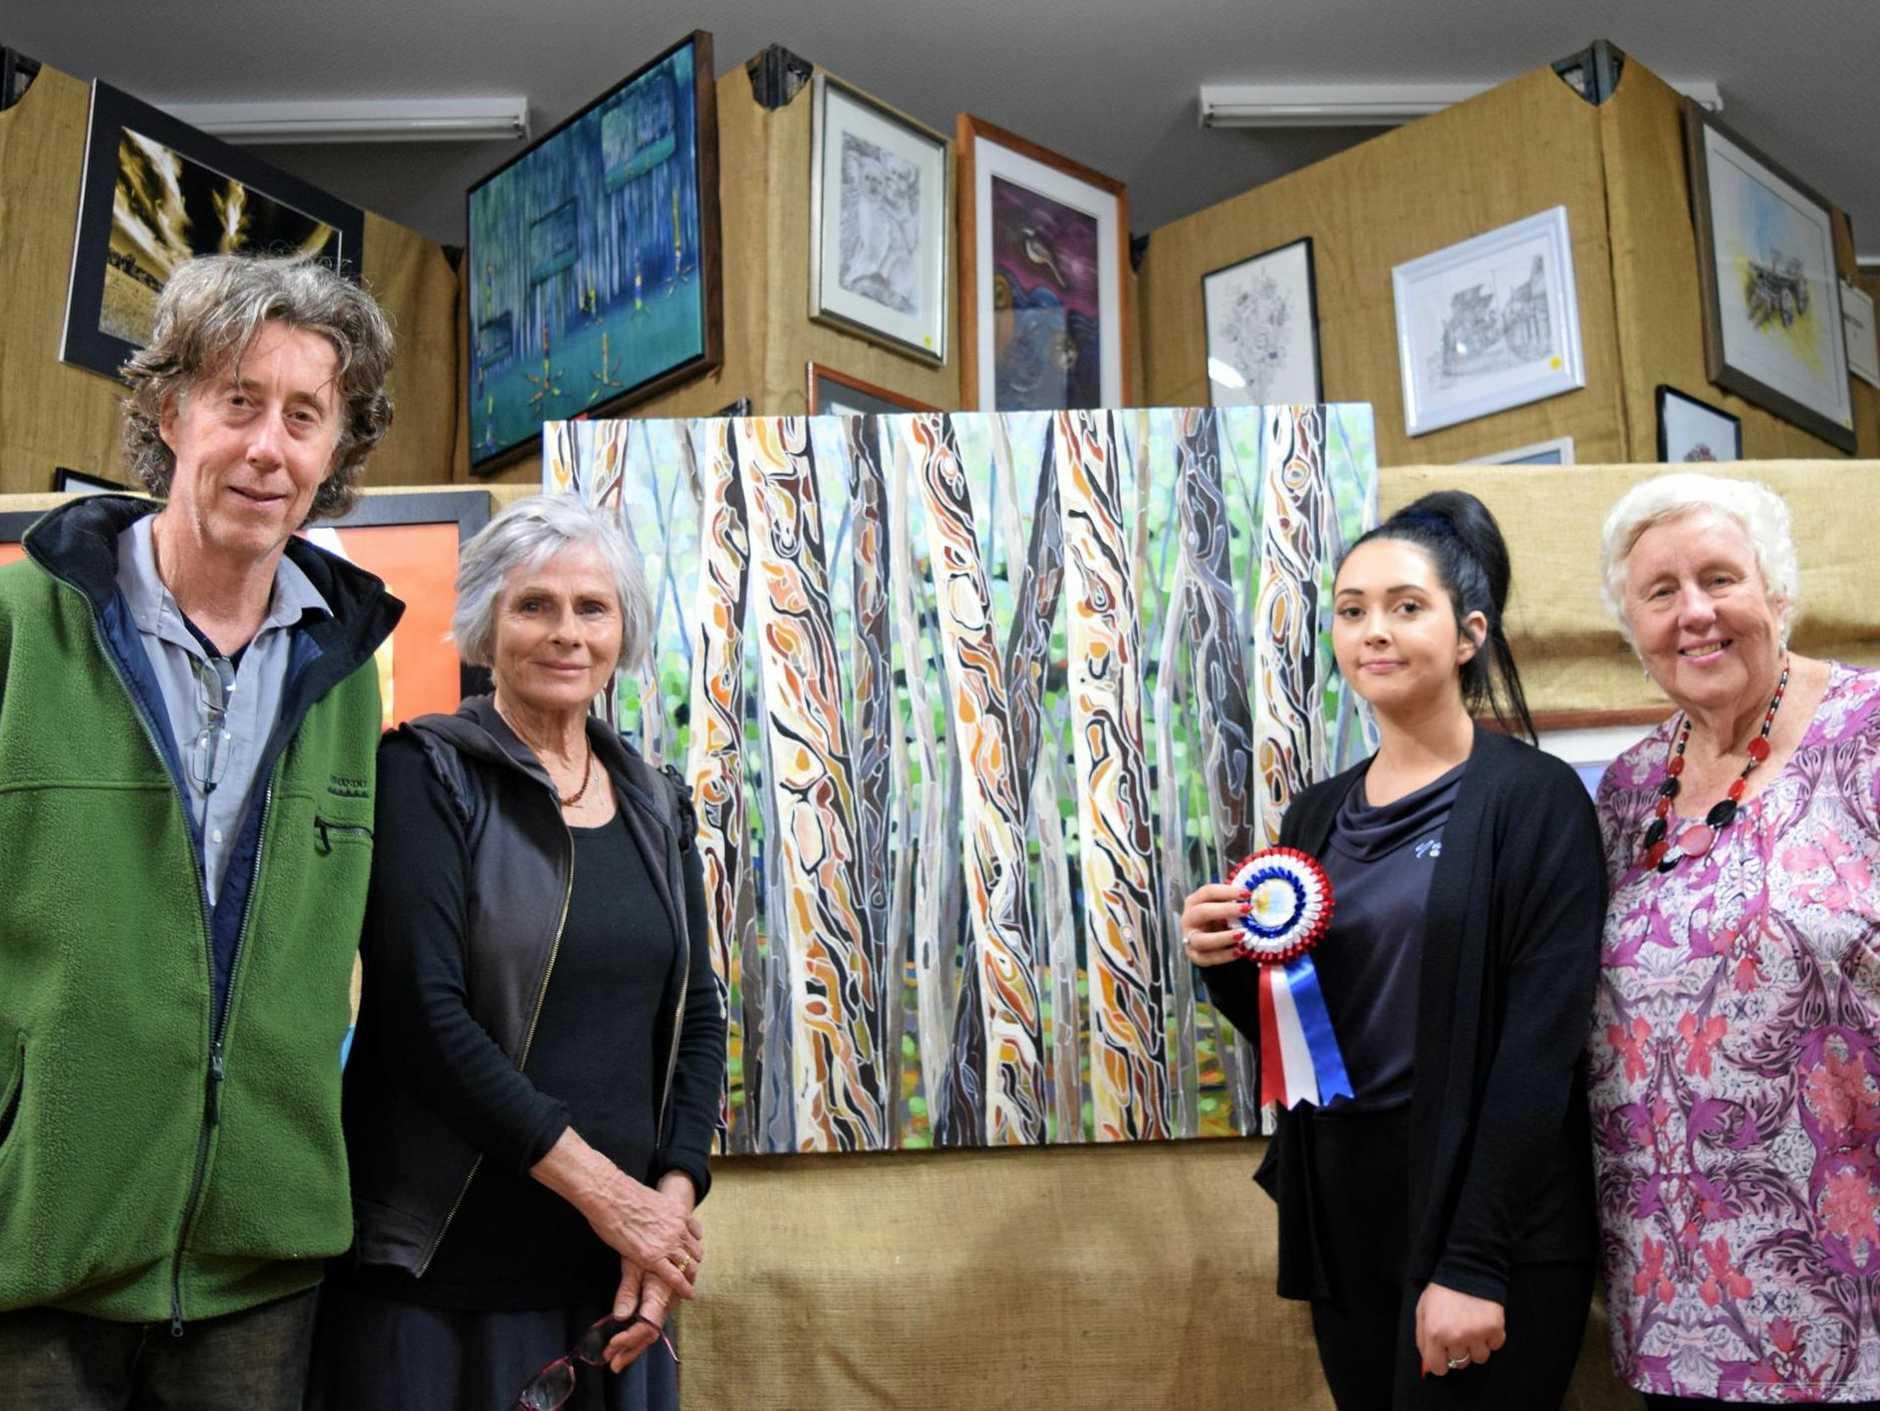 WINNER: (L-R) Bentley Art Prize judges, Oscar Giammichele and Raylee Delaney and Richmond Dairies' Ebony Collis and Bentley Art Prize coordinator Helen Trustum with winning painting by Julie McKenzie.